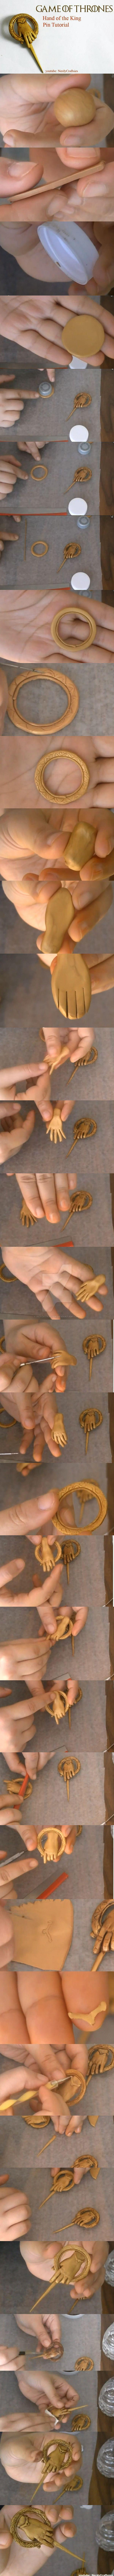 Hand of the King Game of Thrones Tutorial by NerdEcrafter http://nerdecrafter.deviantart.com/art/Hand-of-the-King-Game-of-Thrones-Tutorial-398563478